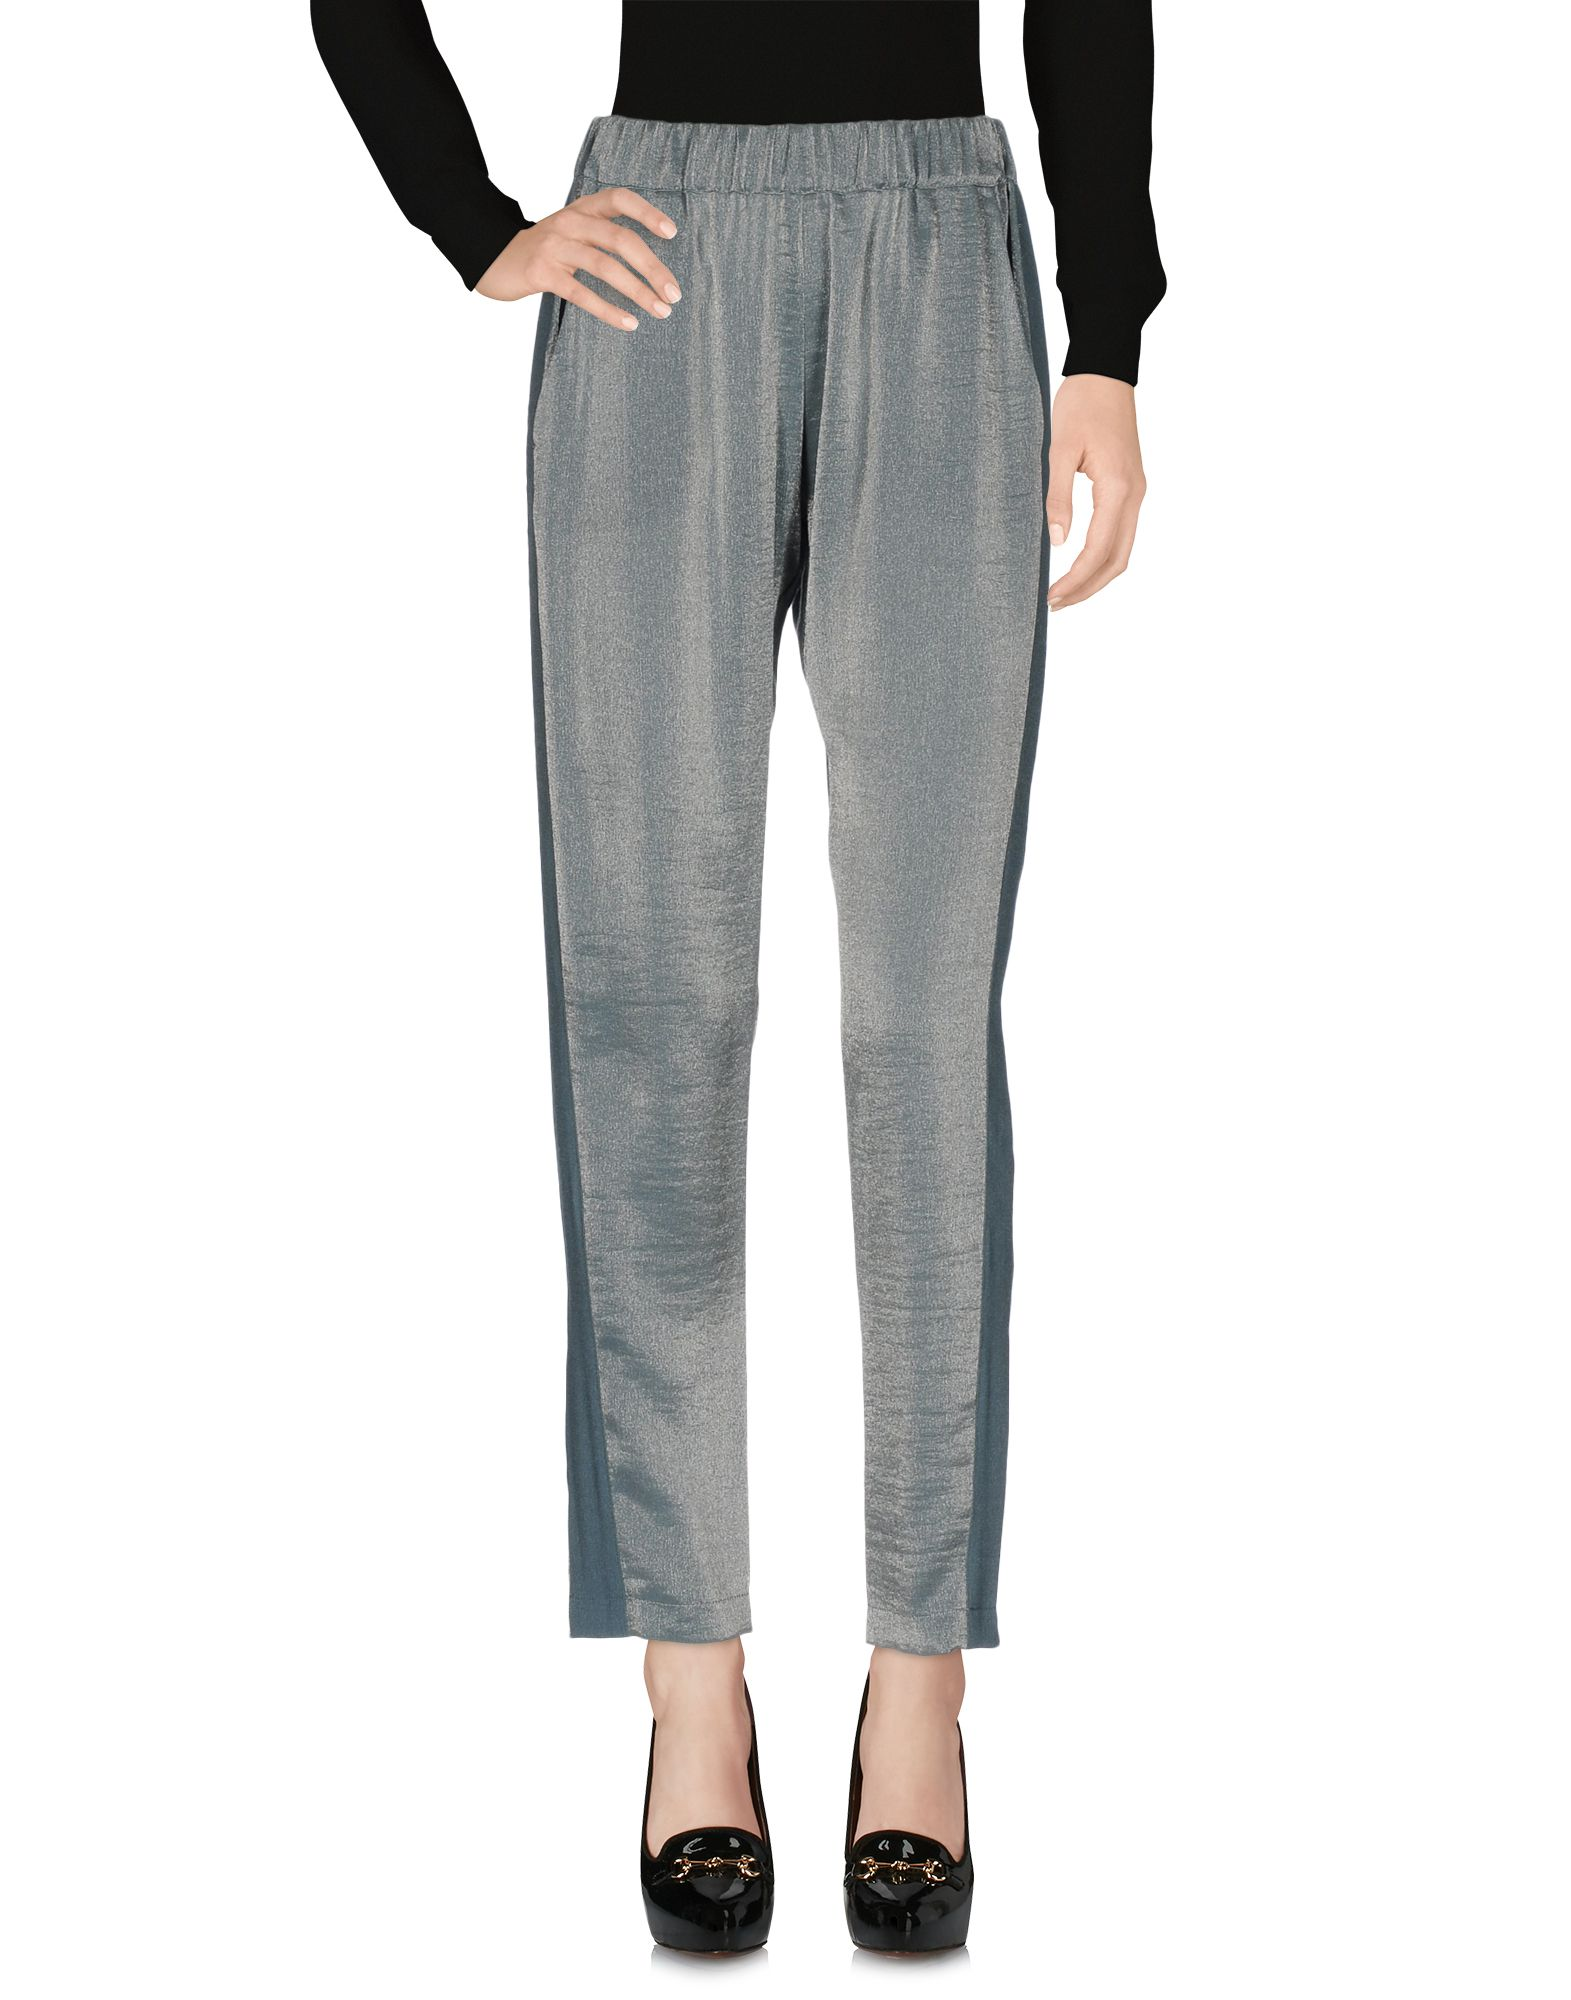 Pantalone Pinko Donna - Acquista online su J6VuUB1